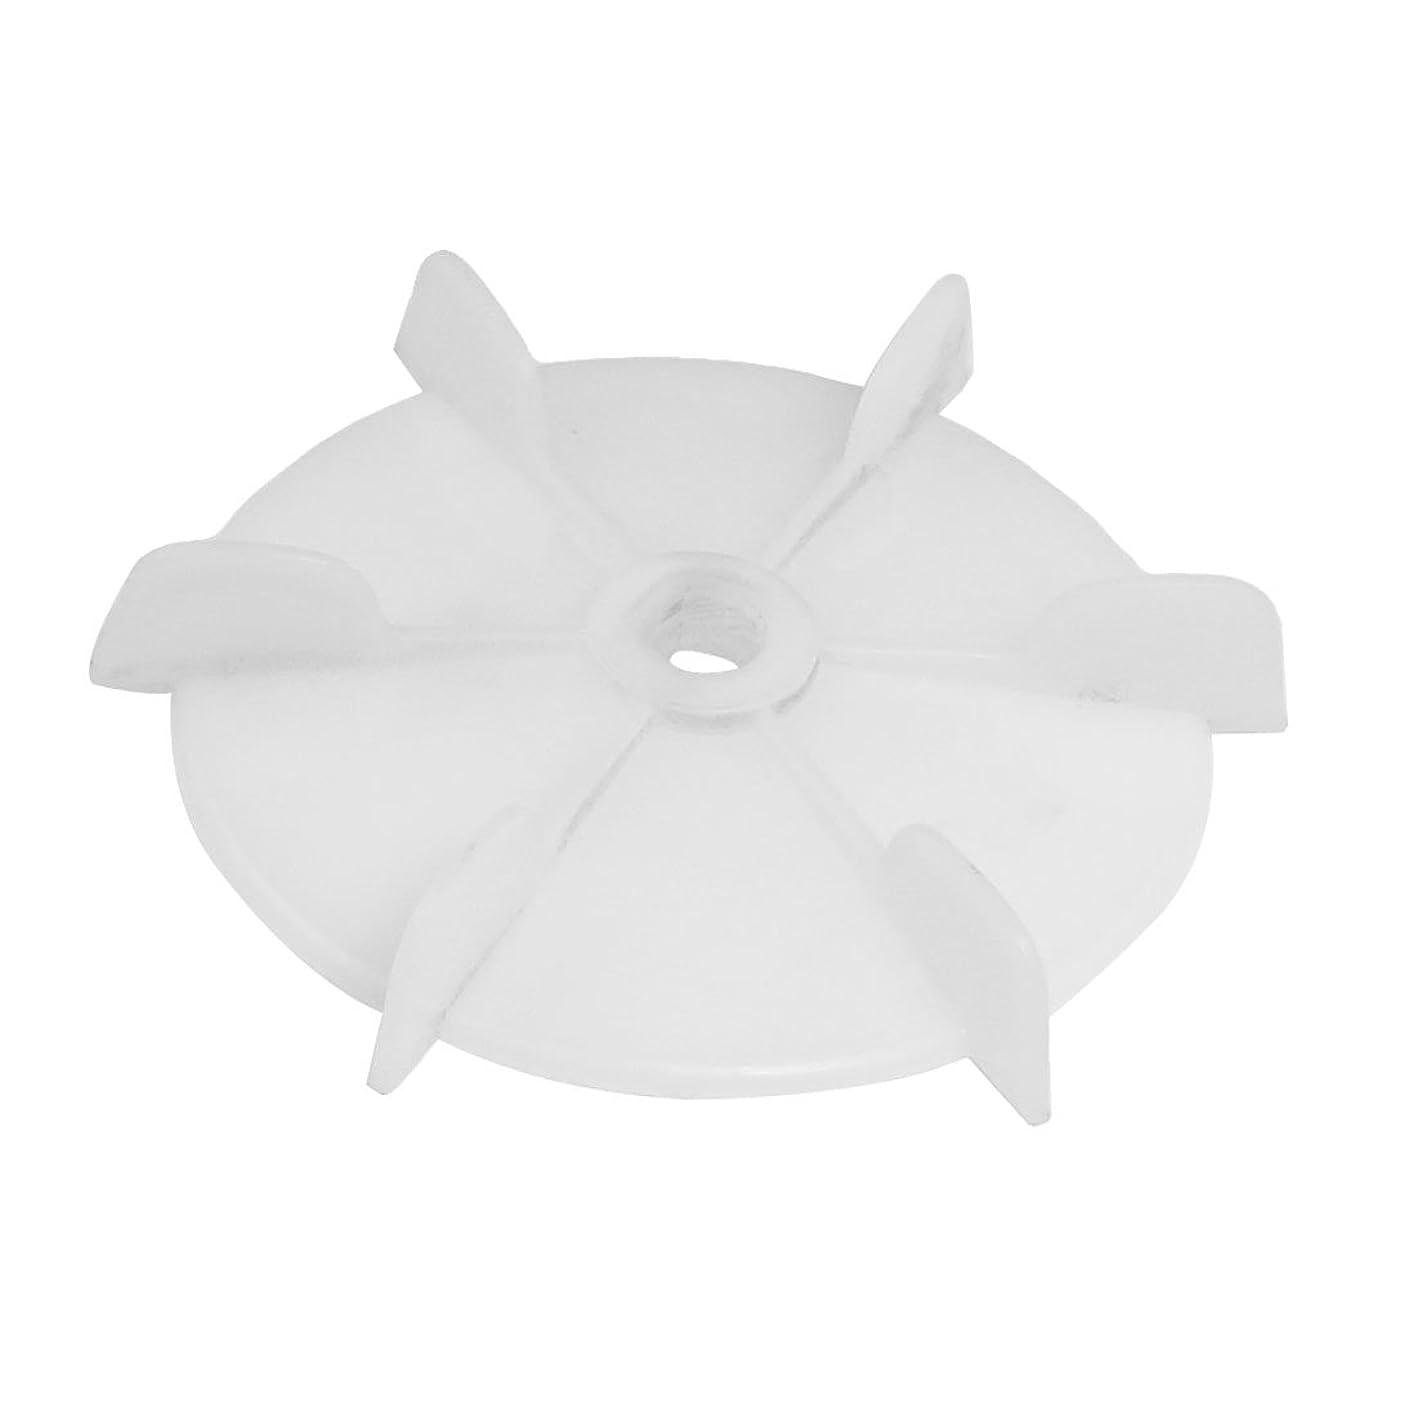 uxcell Spare Part 12mm Inner Dia 6 Impeller Plastic Motor Fan Vane Wheel ziwncsuglcx237